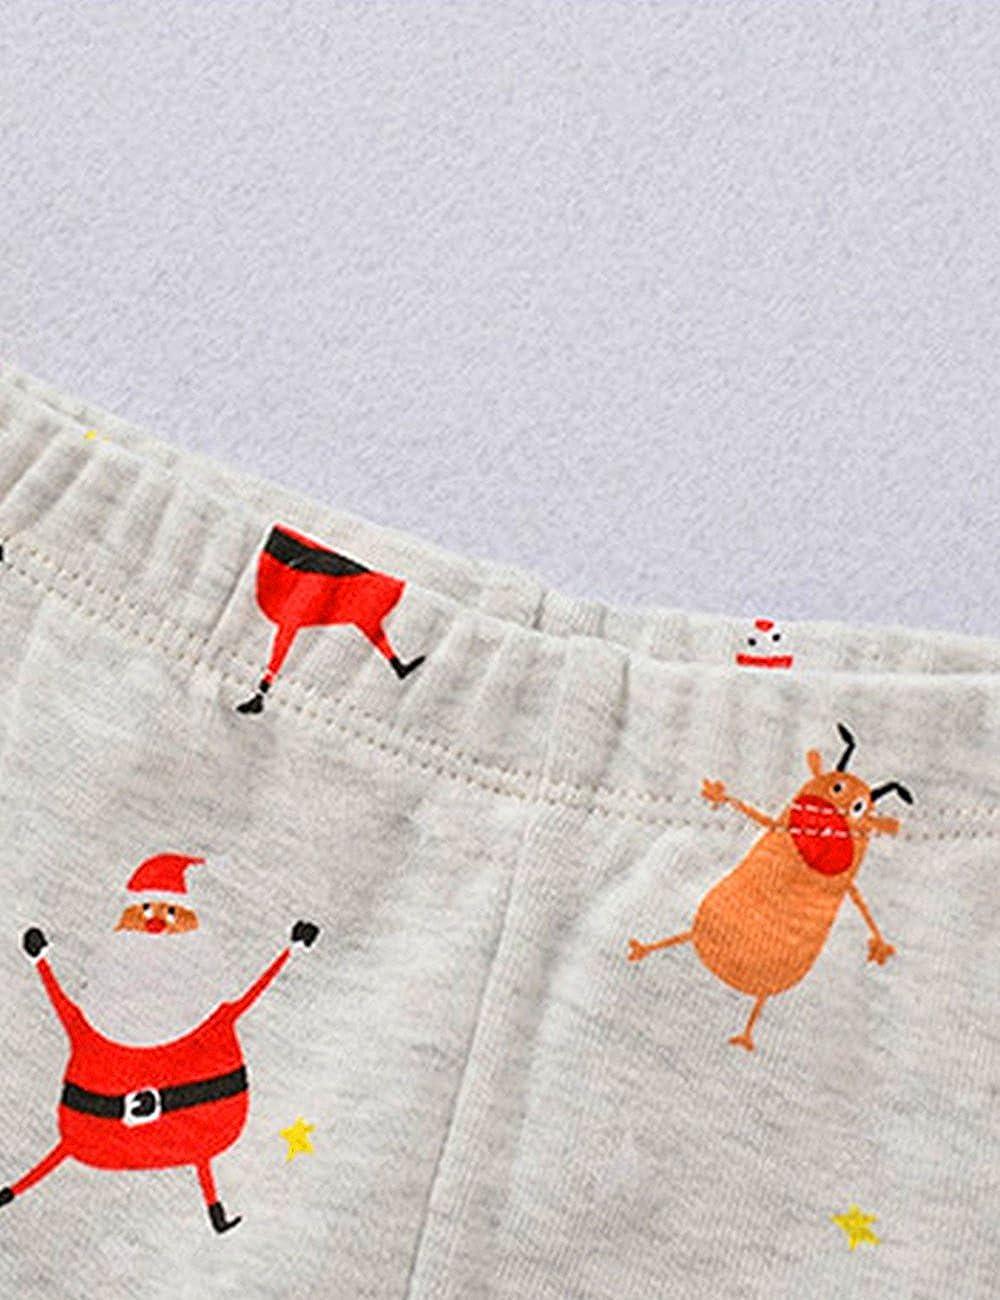 Christmas Boys Pajamas Cotton Toddler Pjs Sleepwear Kids Clothes Pant Set